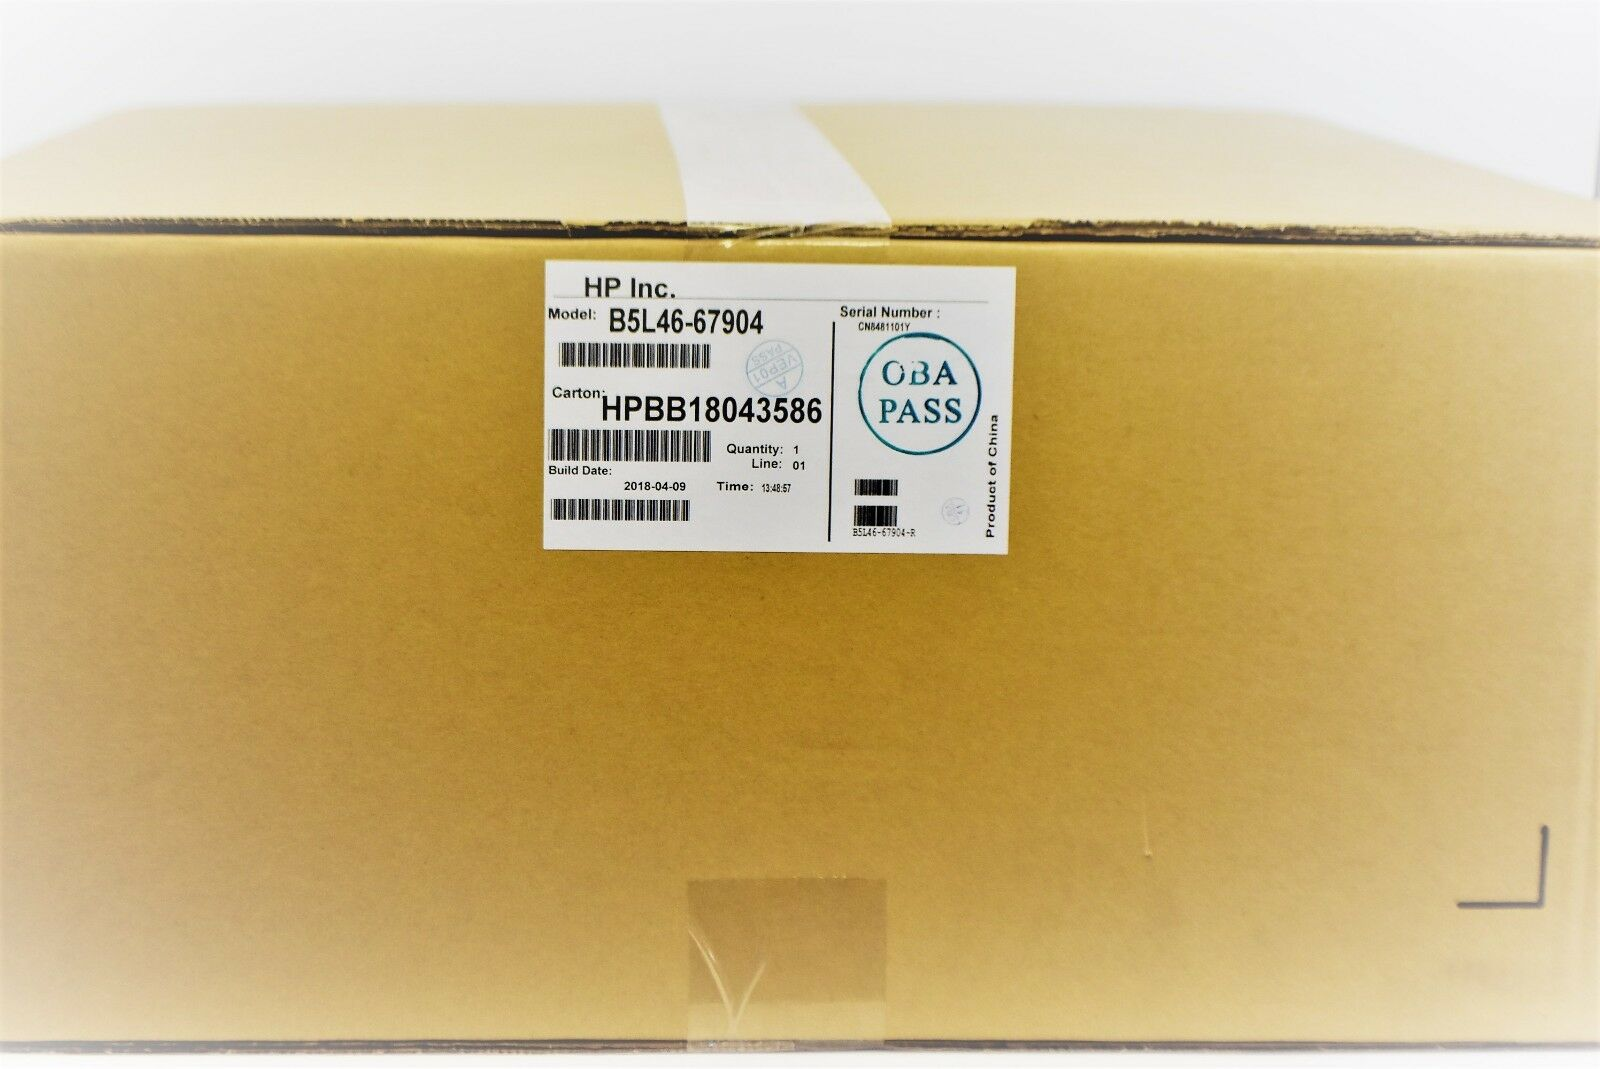 4350 Fuser Maint Kit                   ●●●OUTRIGHT●●● 4250 Q5421A HP LJ 4240